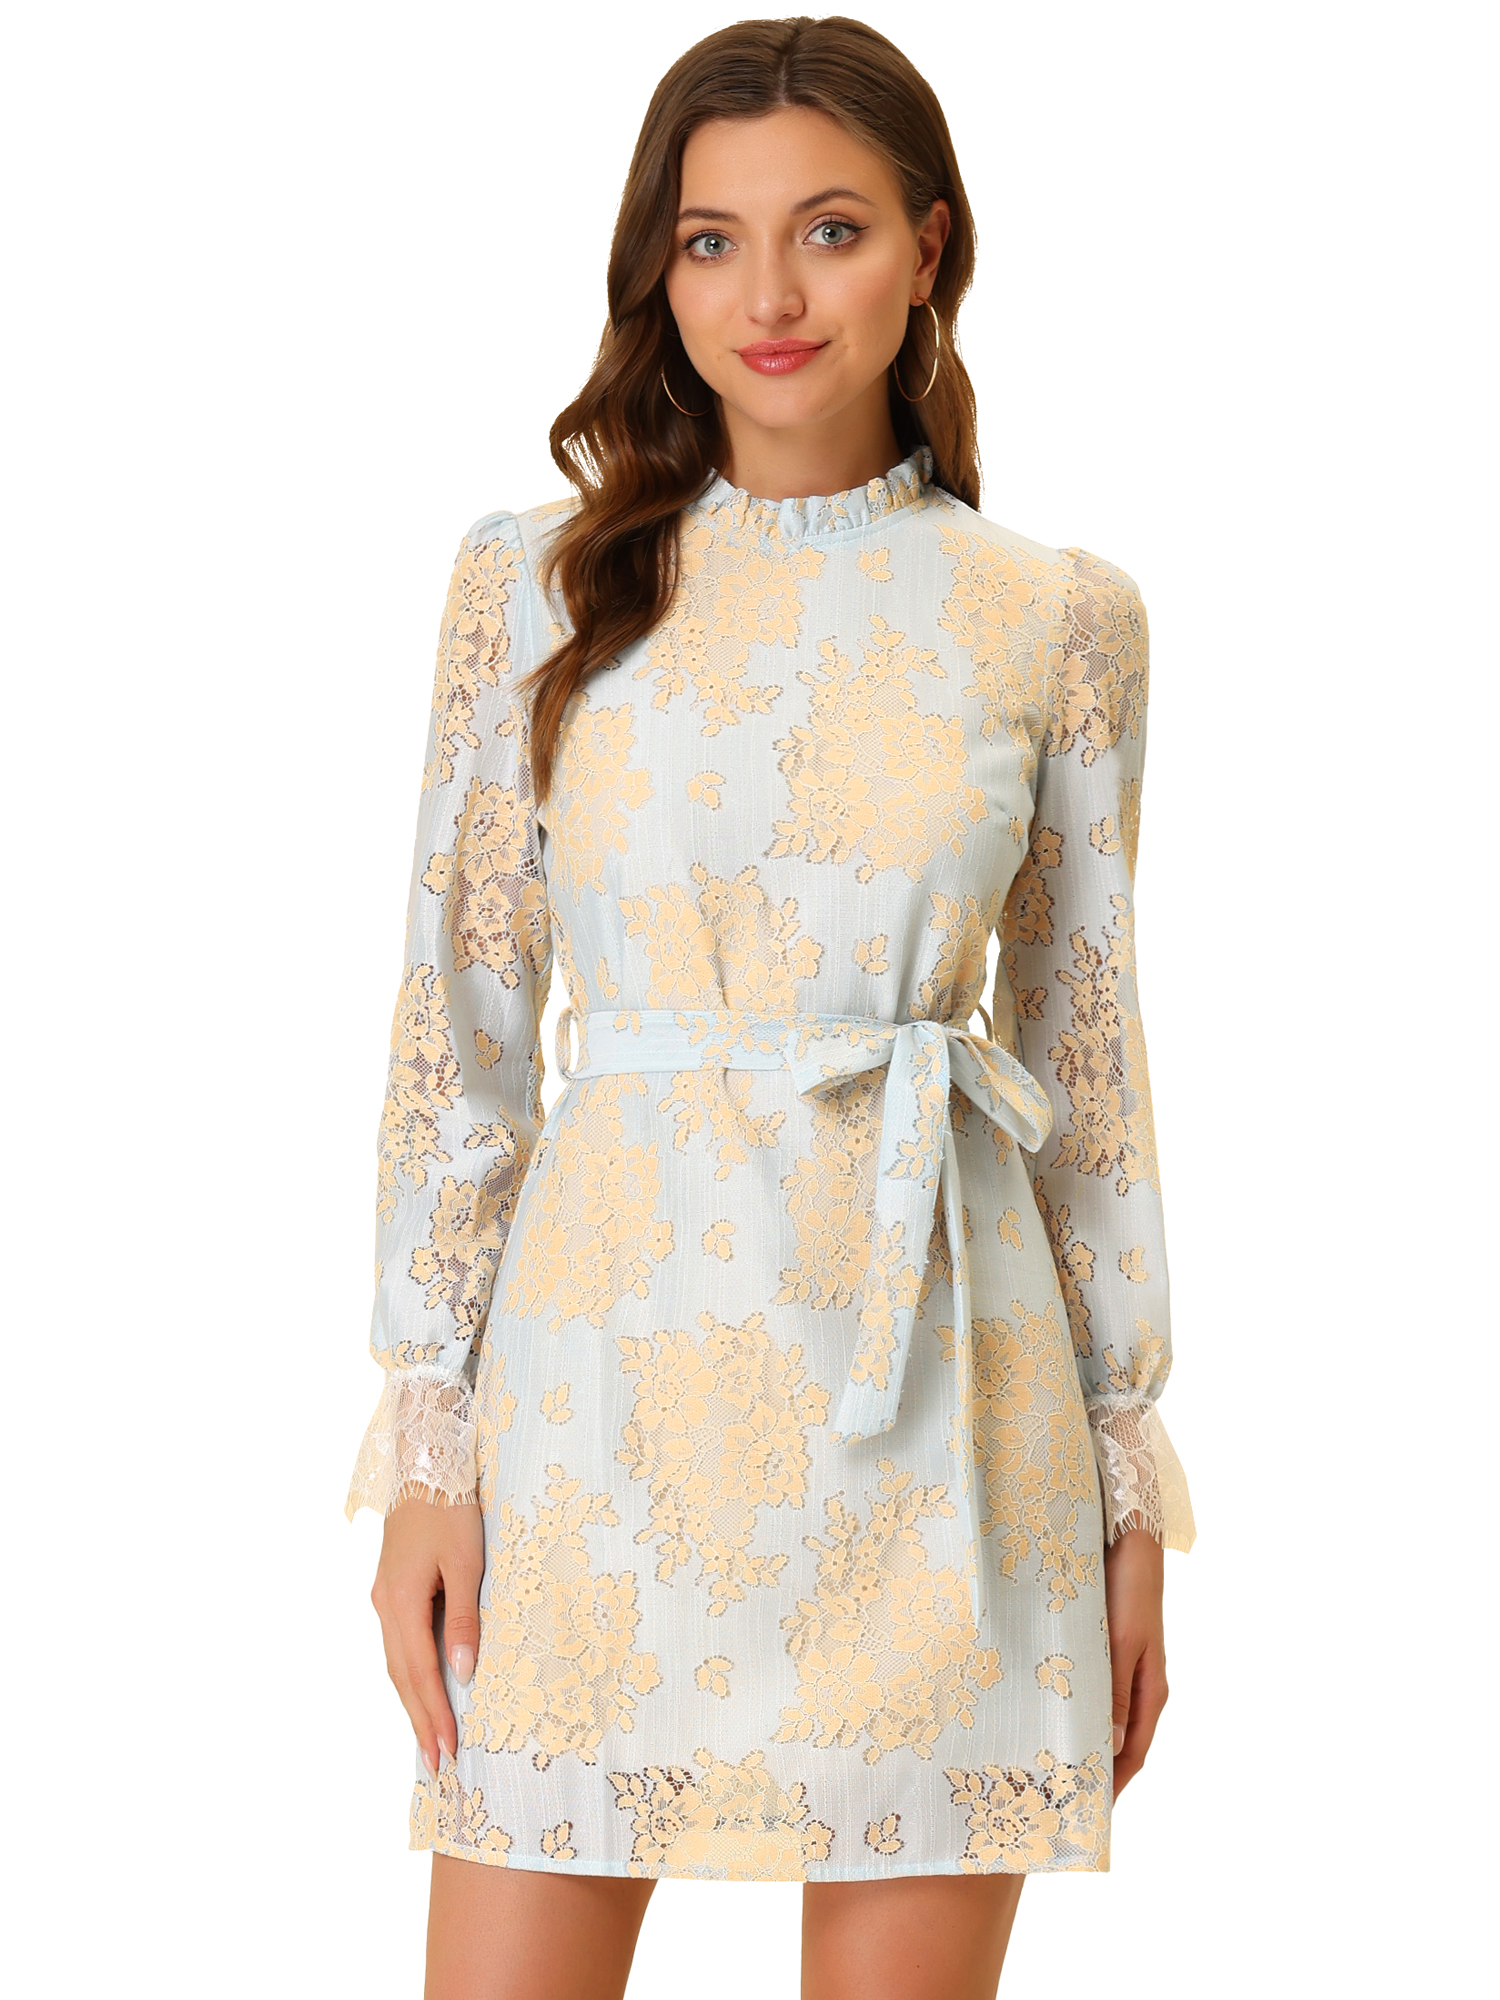 Allegra K Women's Ruffle Crew Neck Mini Floral Lace Dress Light Blue M